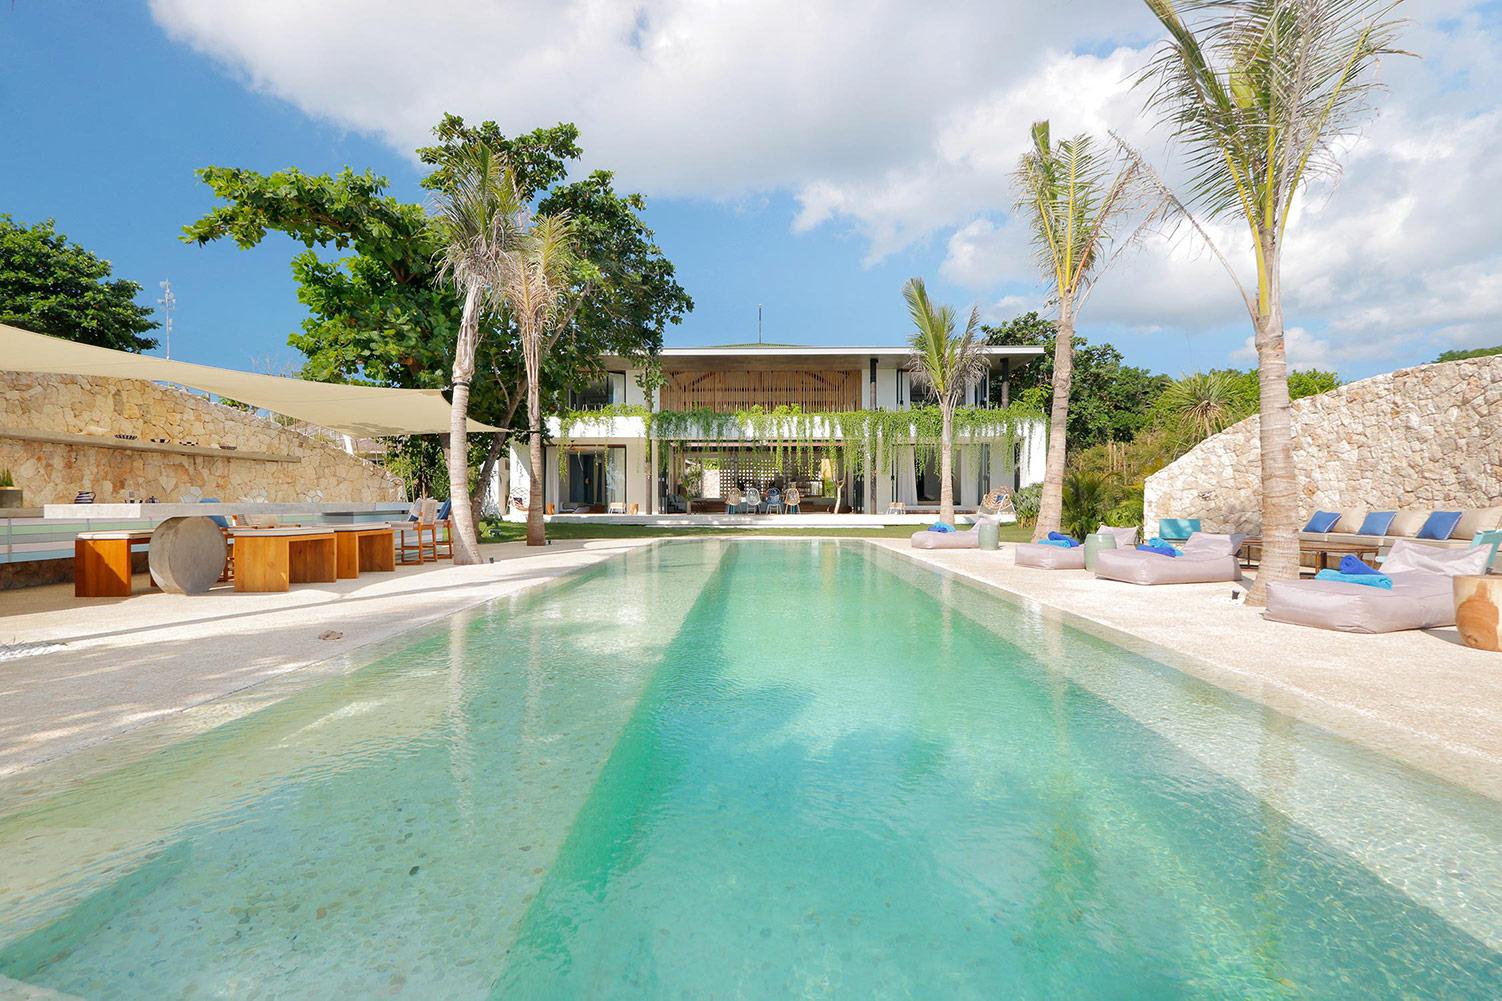 An hybrid between a Mediterranean and a tropical villa